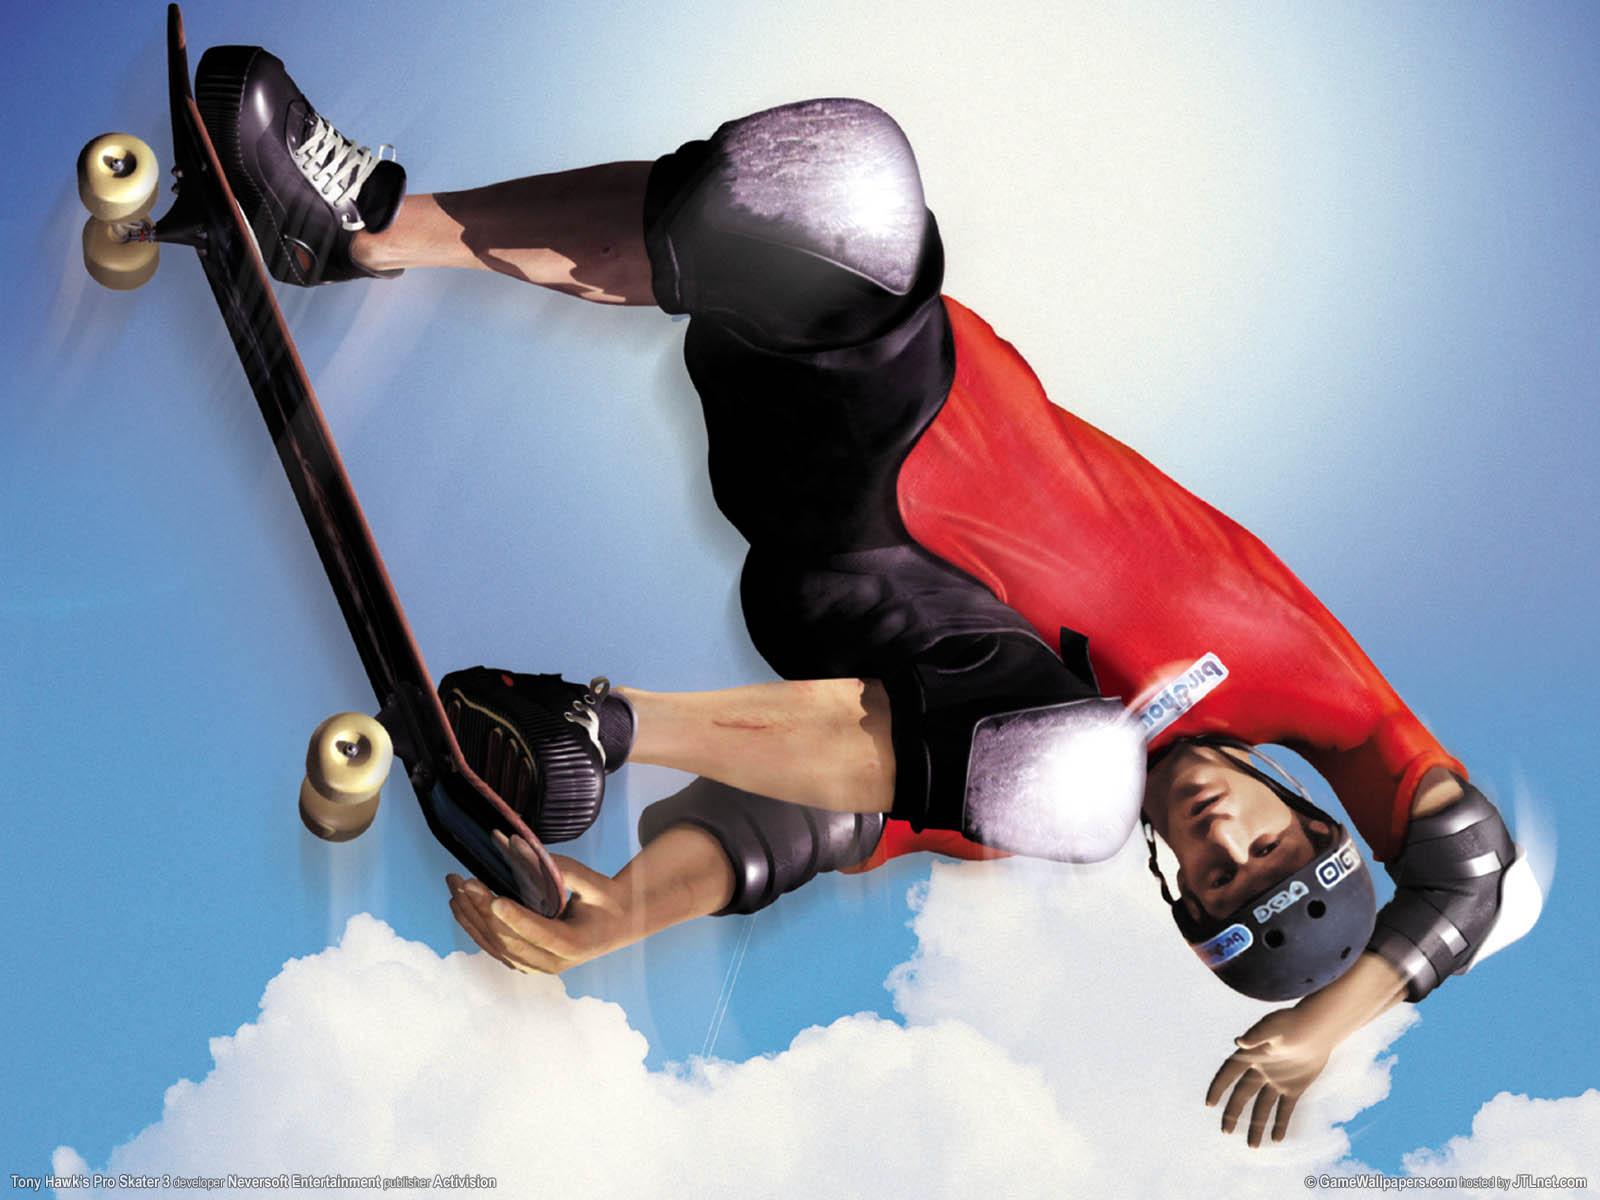 Tony Hawk's Pro Skater 3 wallpaper 02 1600x1200